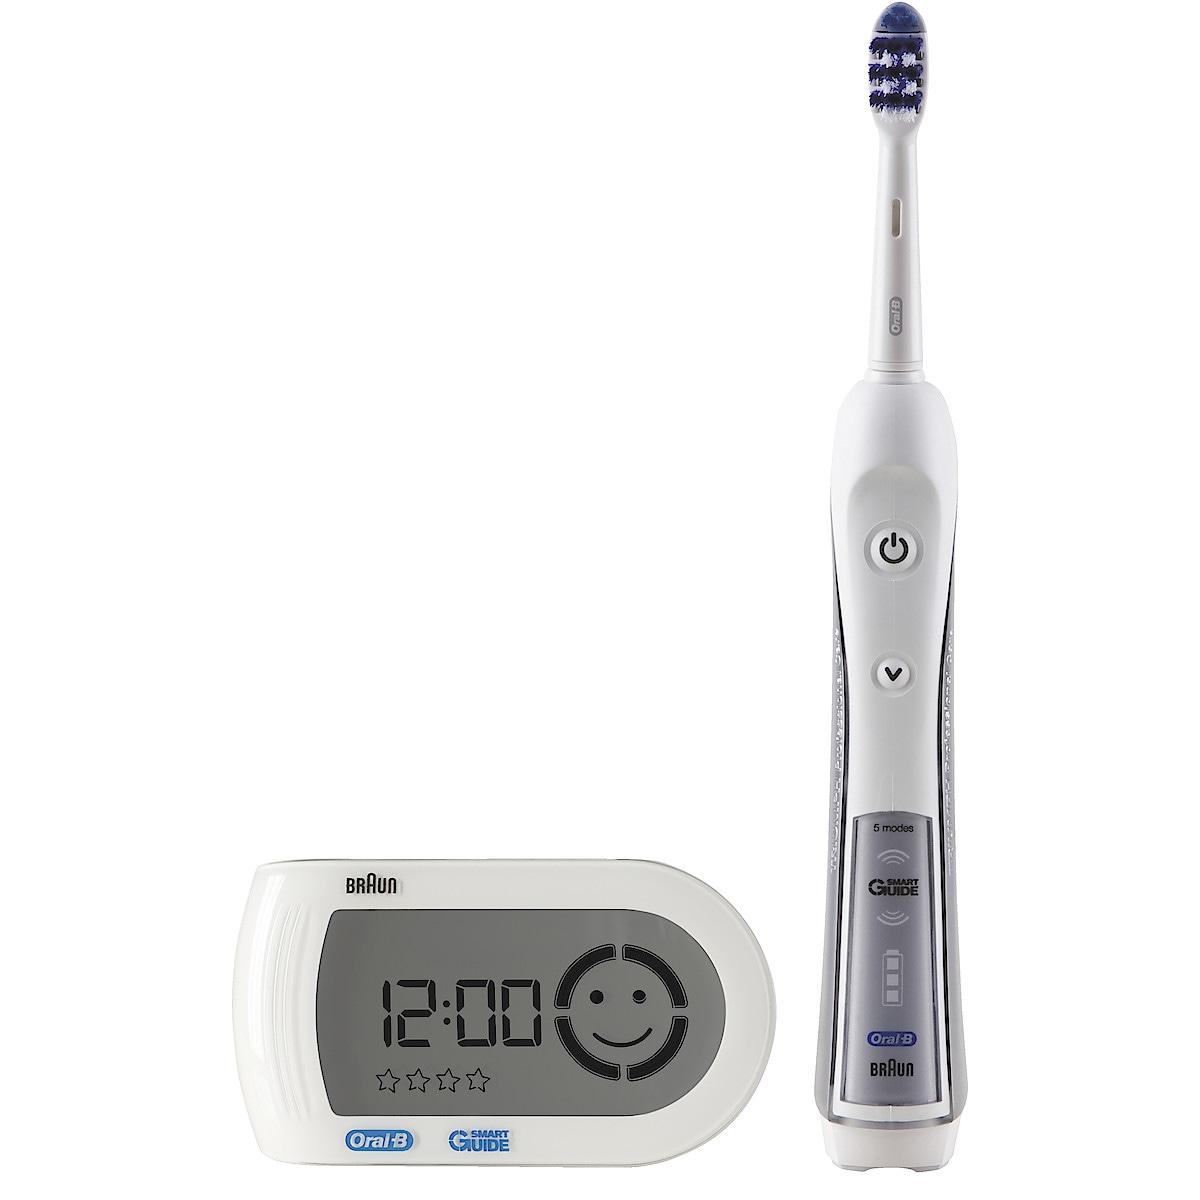 Braun Oral-B TriZone 5000 elektrisk tannbørste